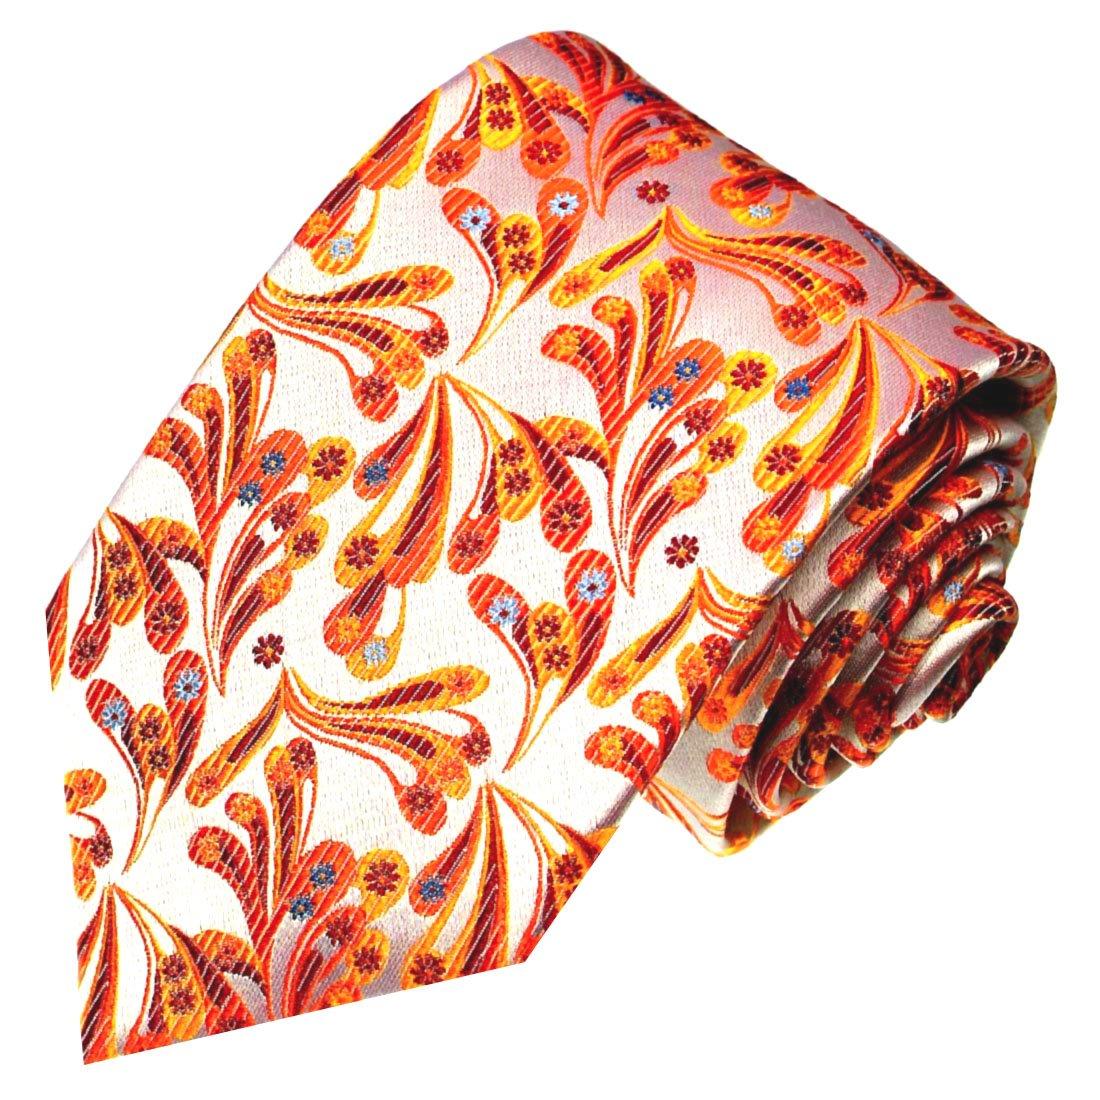 Luxury Italian 100/% Pure Silk Tie Jacquard Woven Necktie Pink Orange Patterned 84209 LORENZO CANA